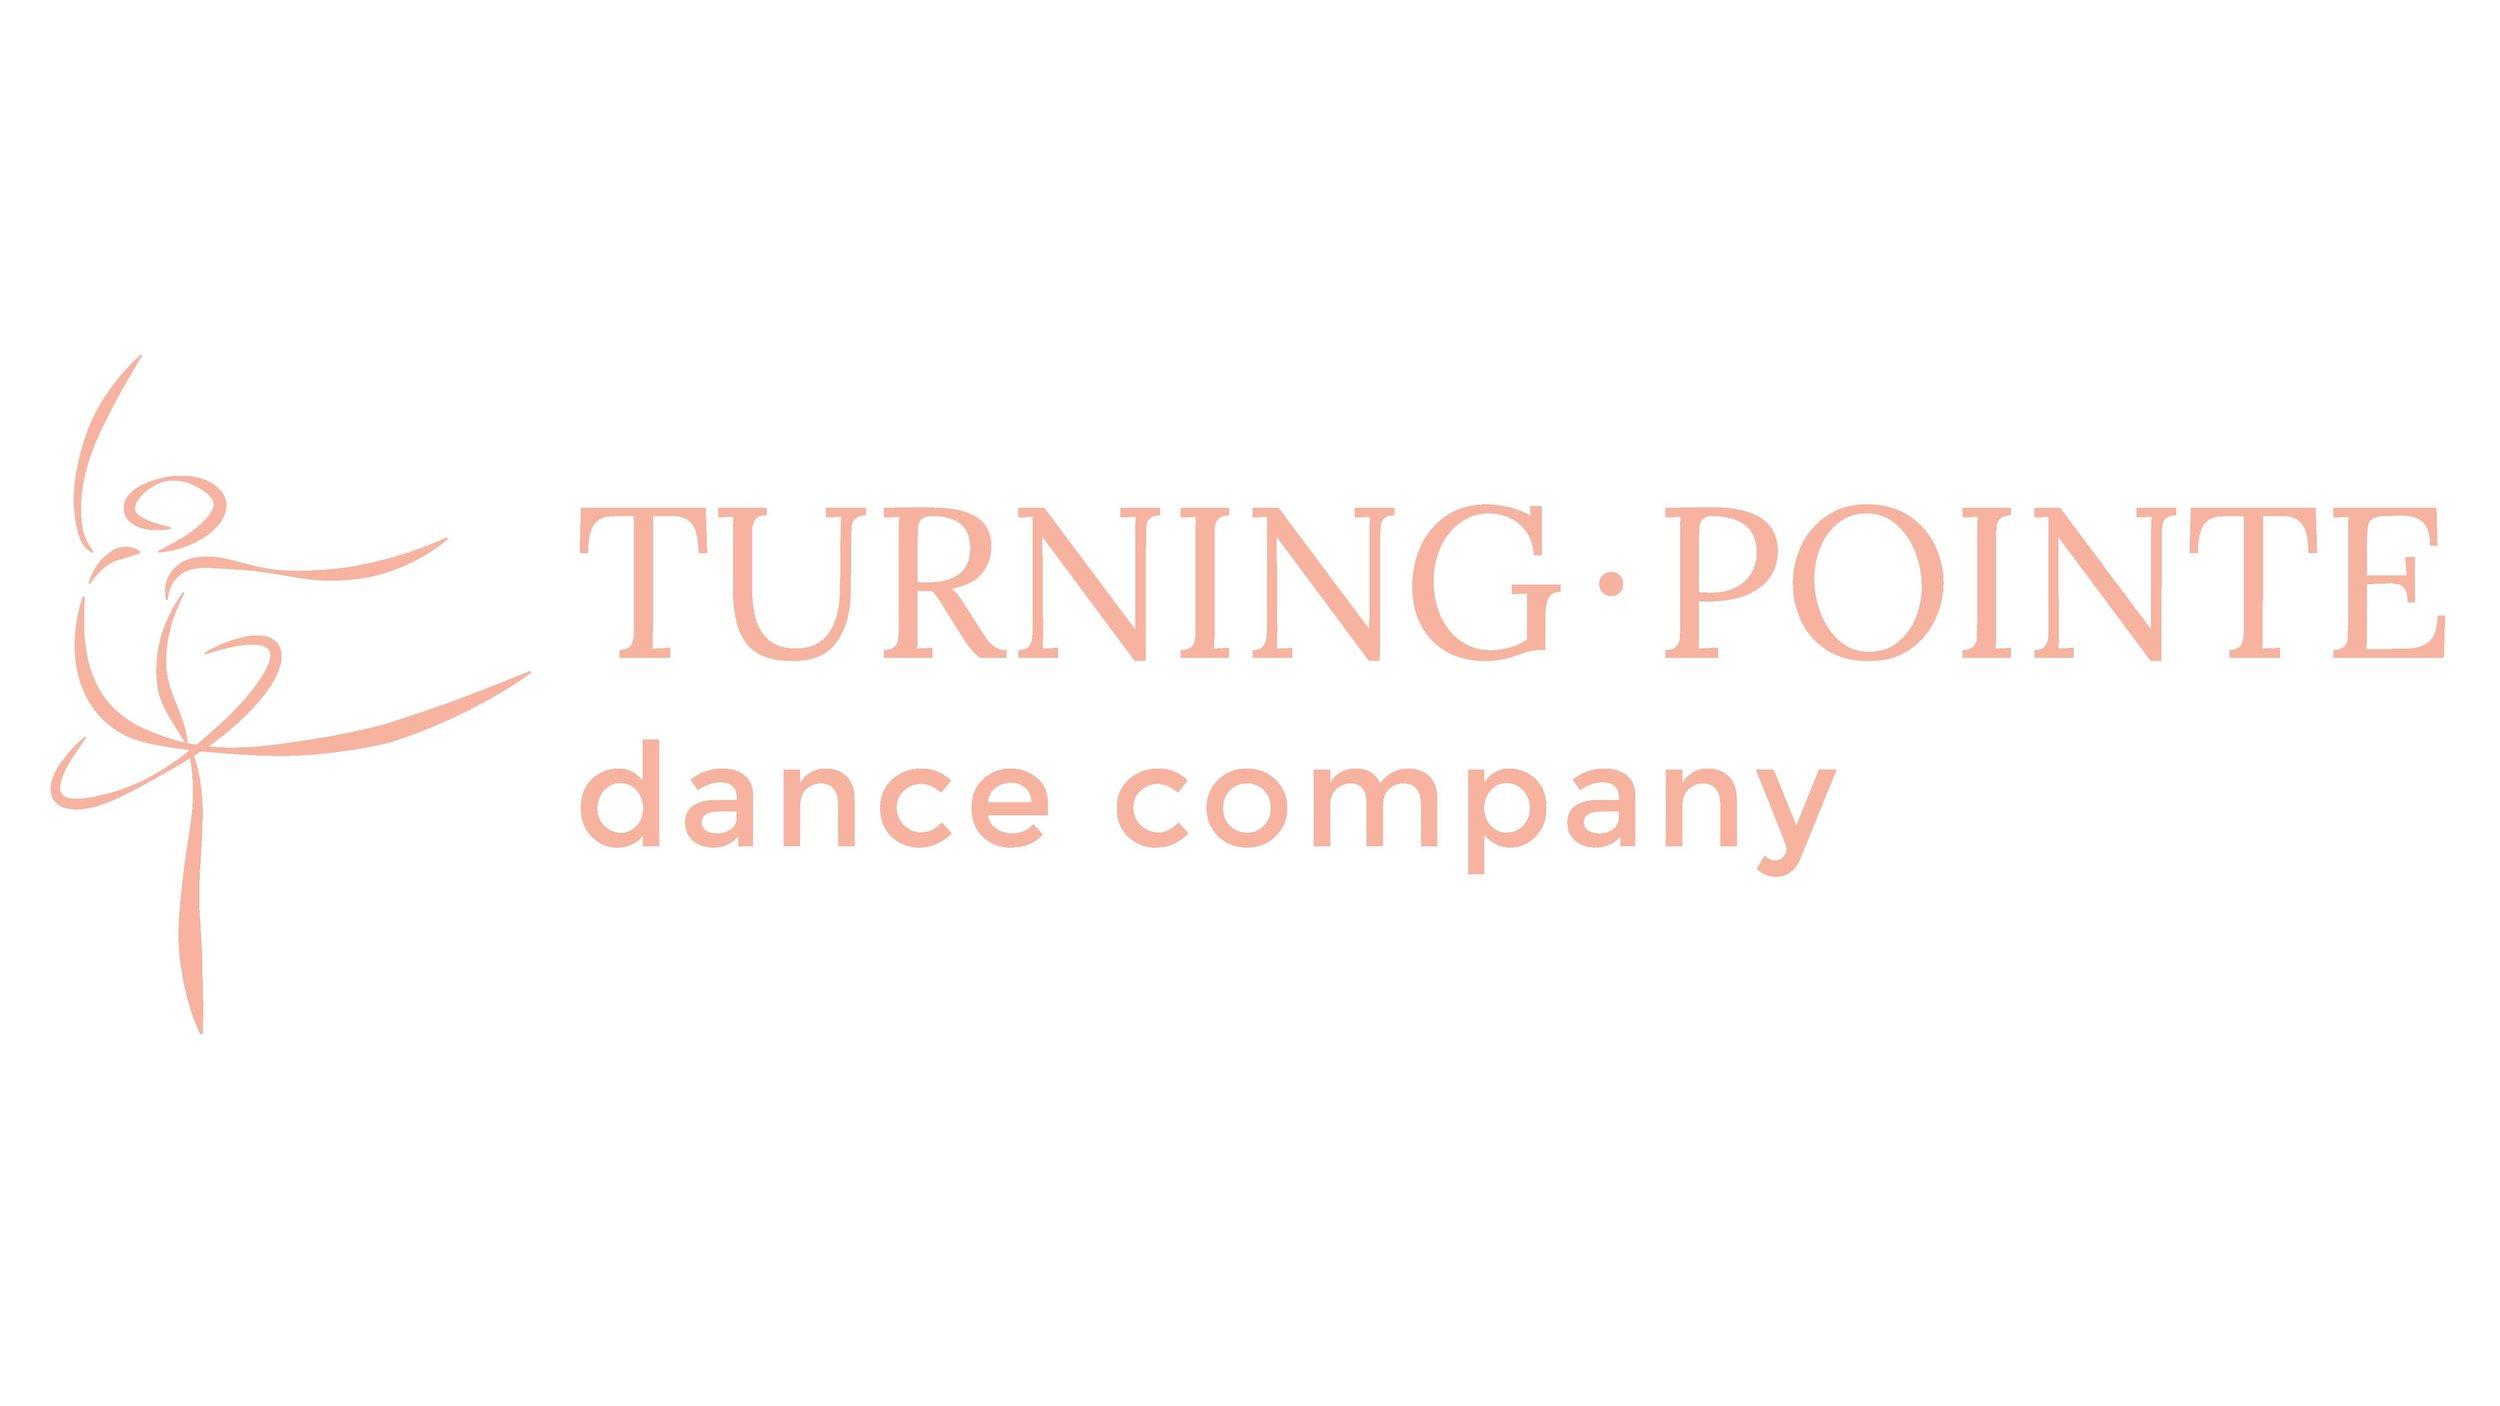 TurningPointe_Logo_Color v2.jpg